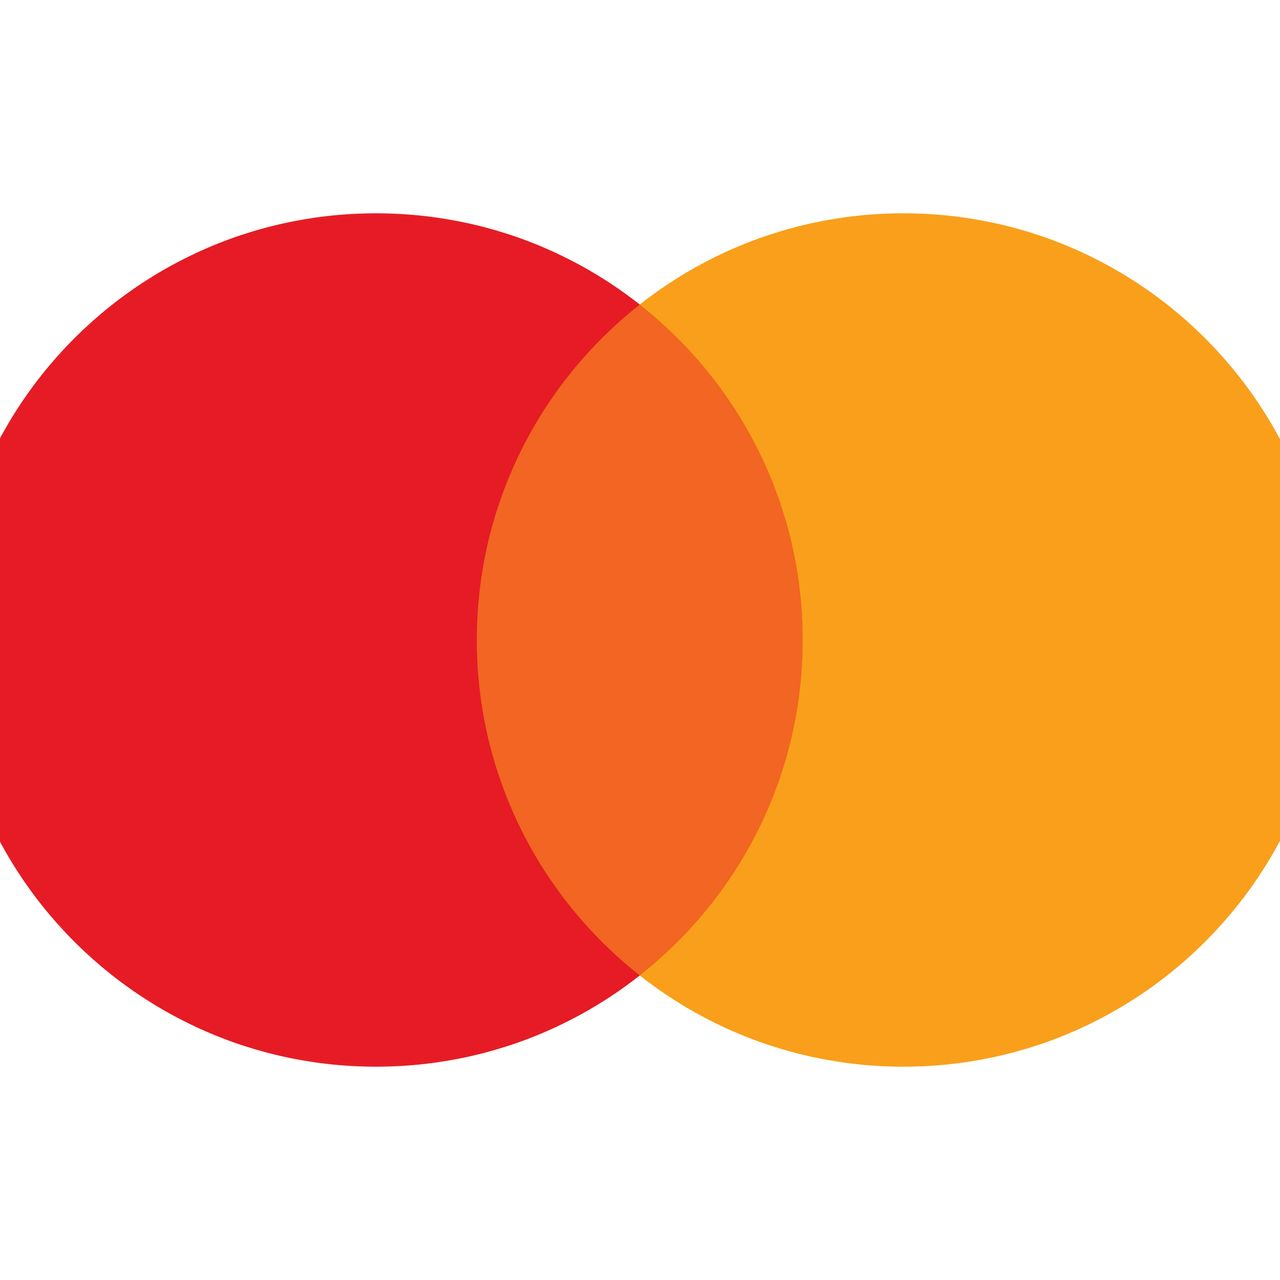 Mastercard Drops Its Name from Logo.